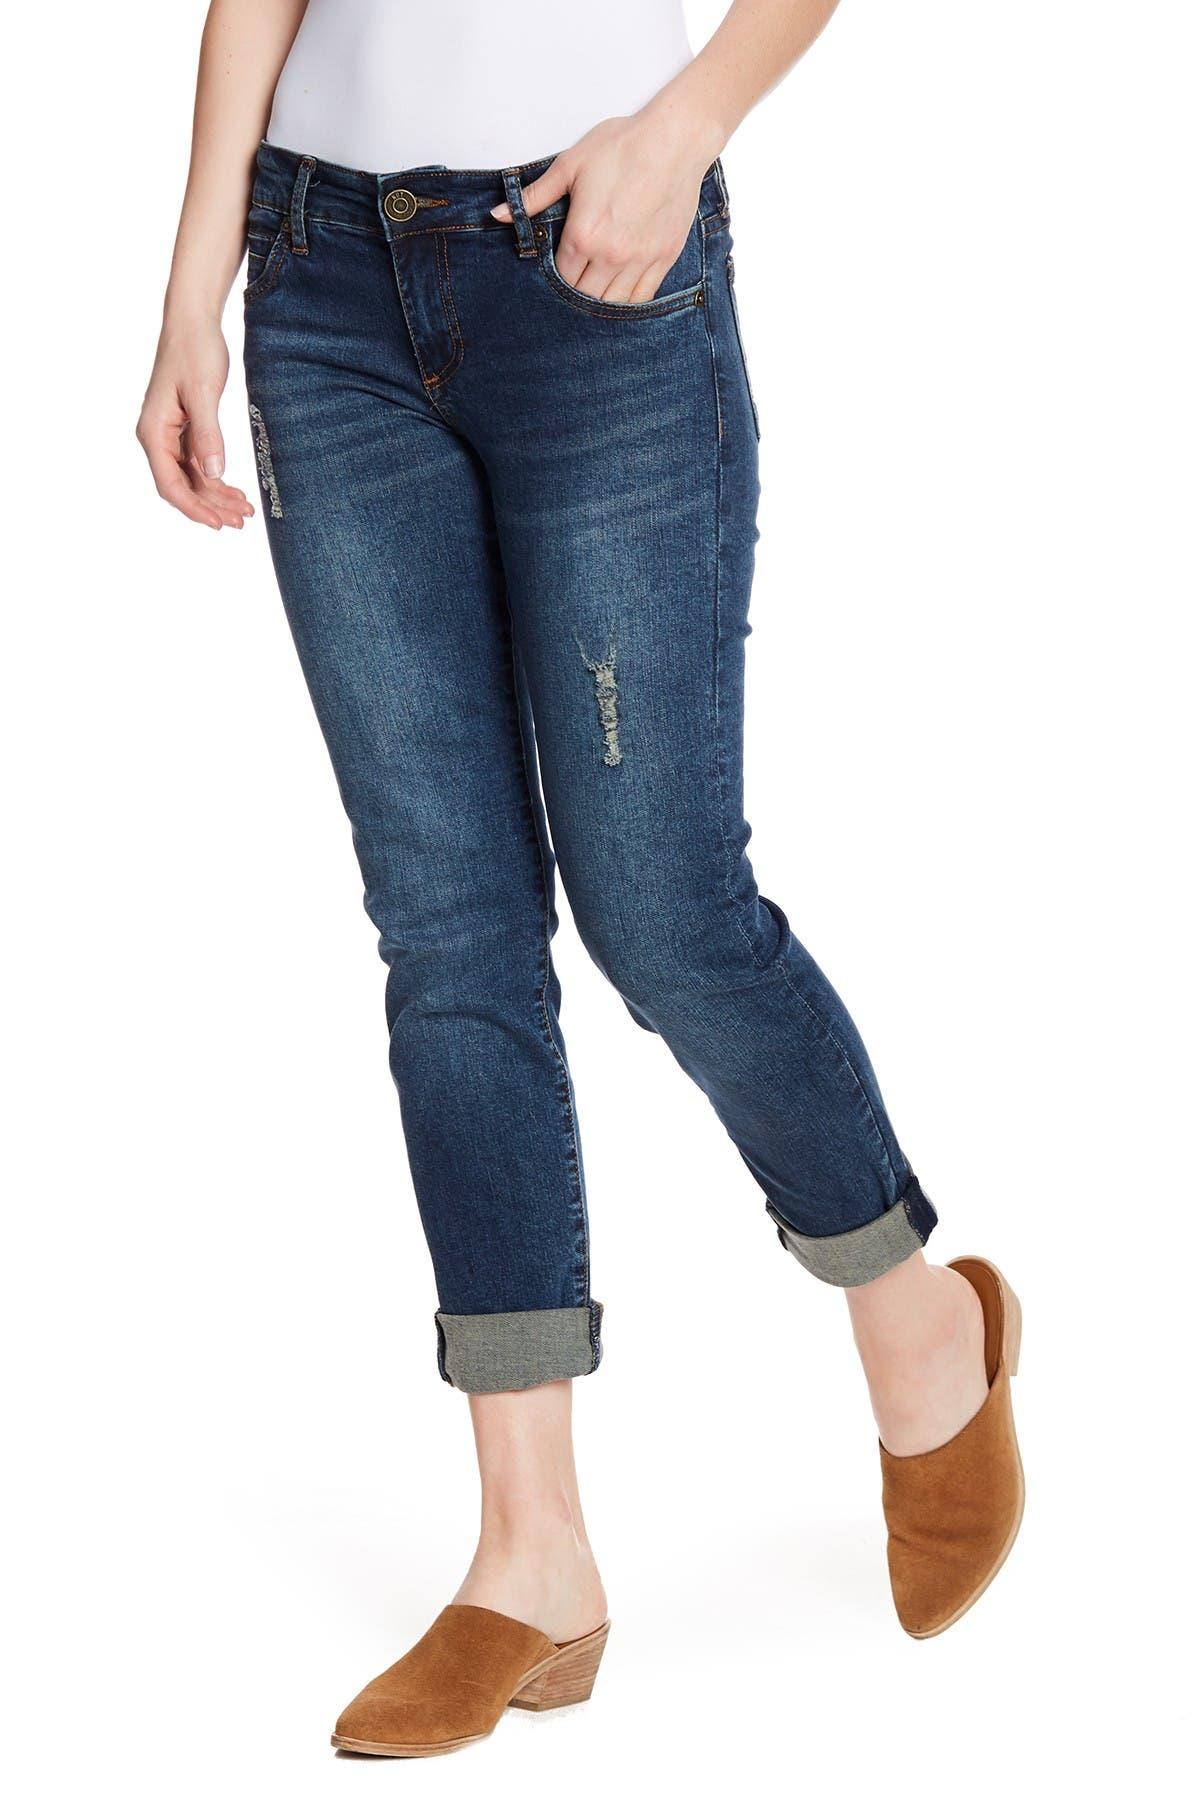 Image of KUT from the Kloth Katy Boyfriend Jeans